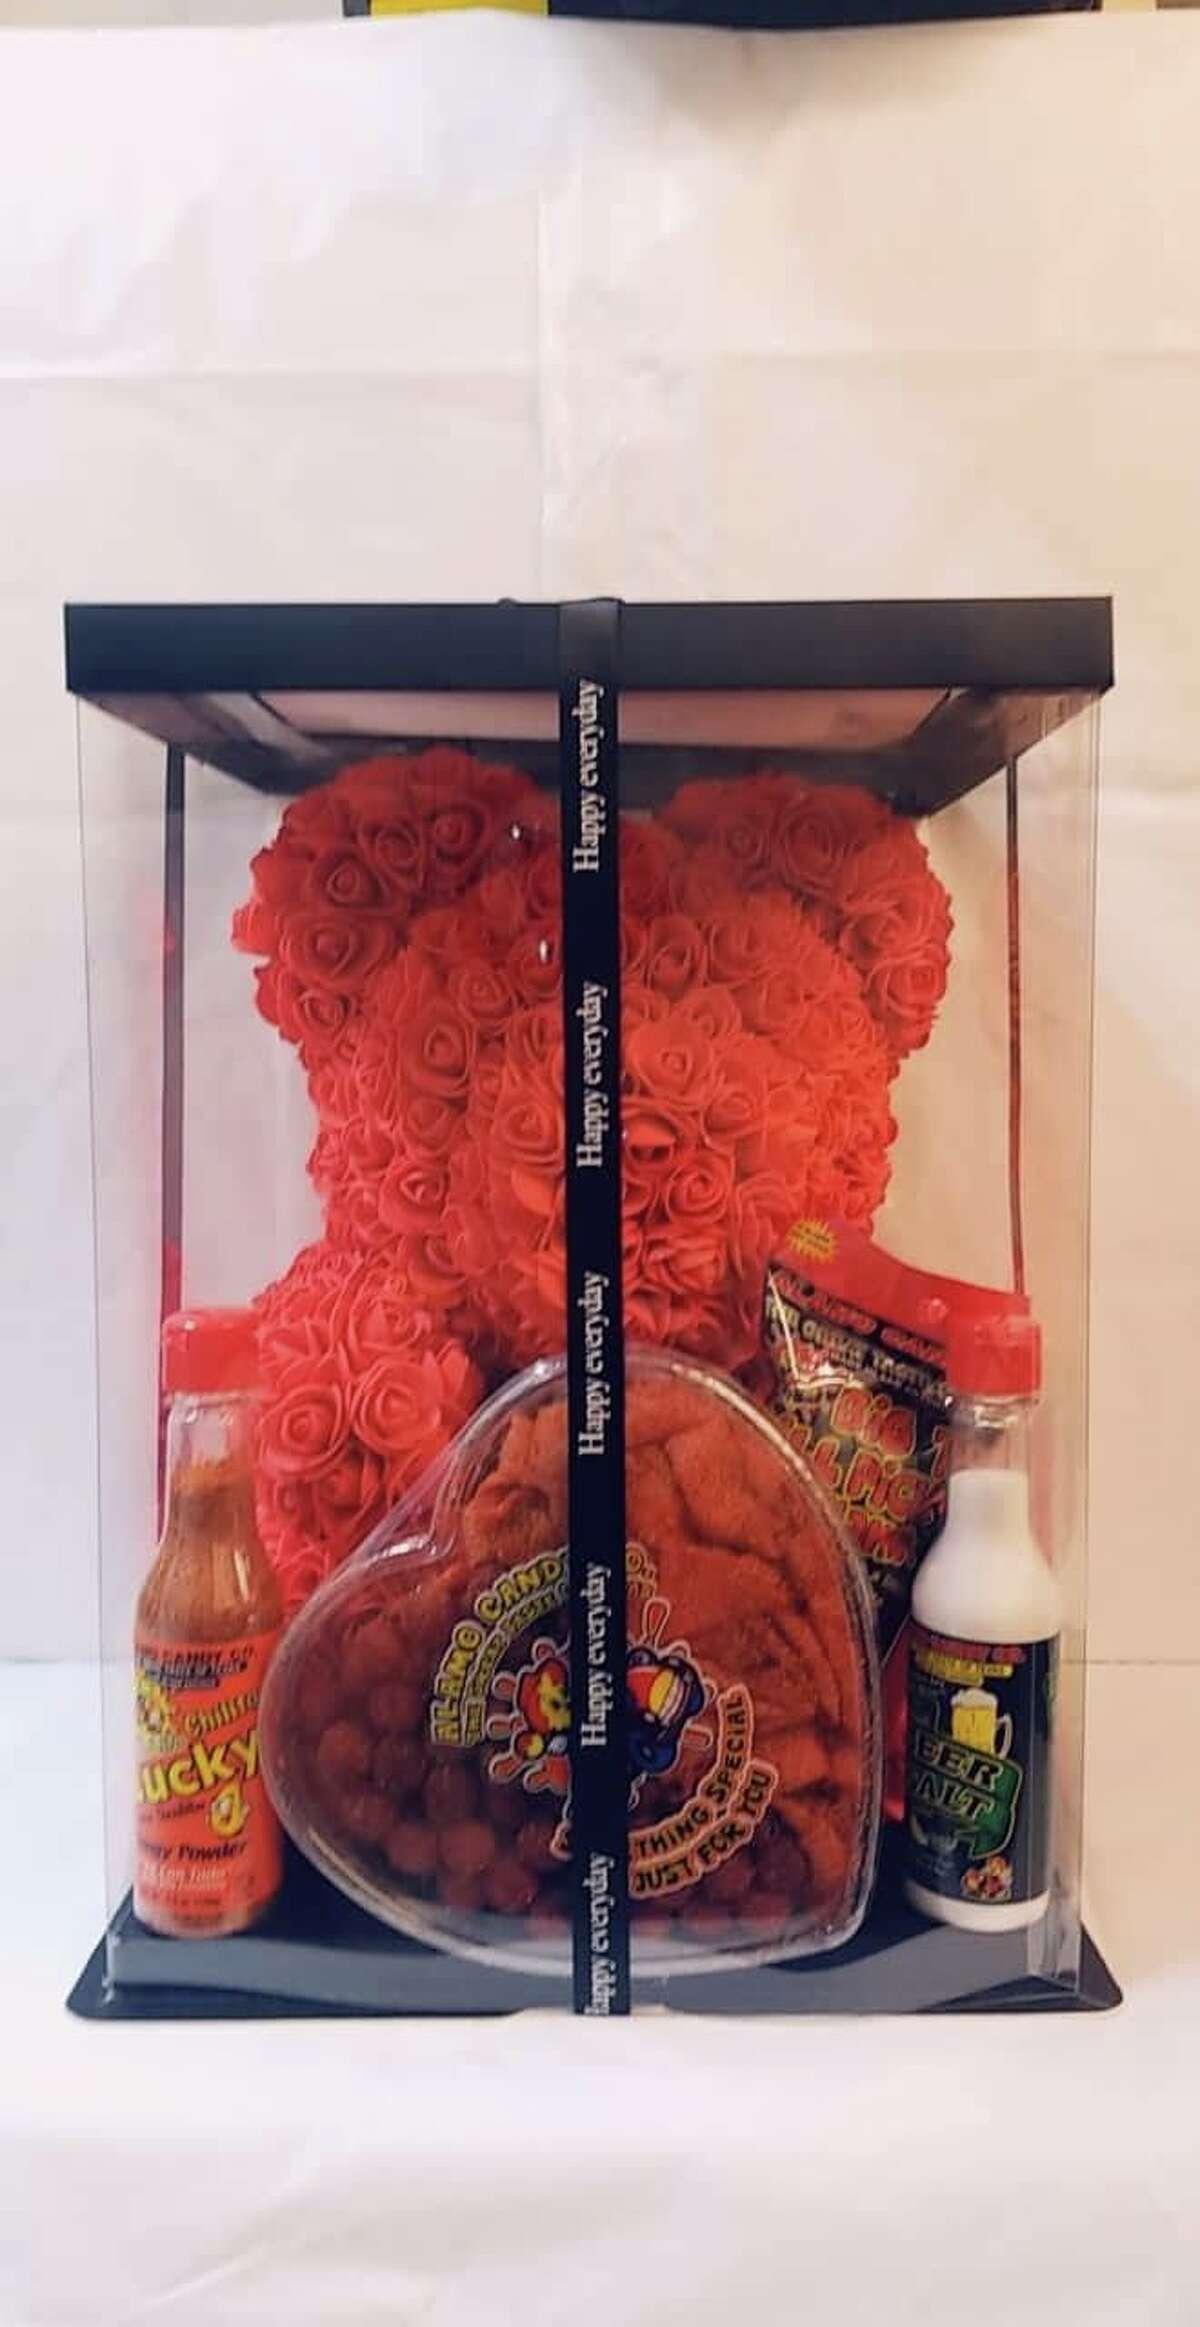 Bear Gift Set with Alamo Candy Co. heart $59.99 At Alamo Candy Co.